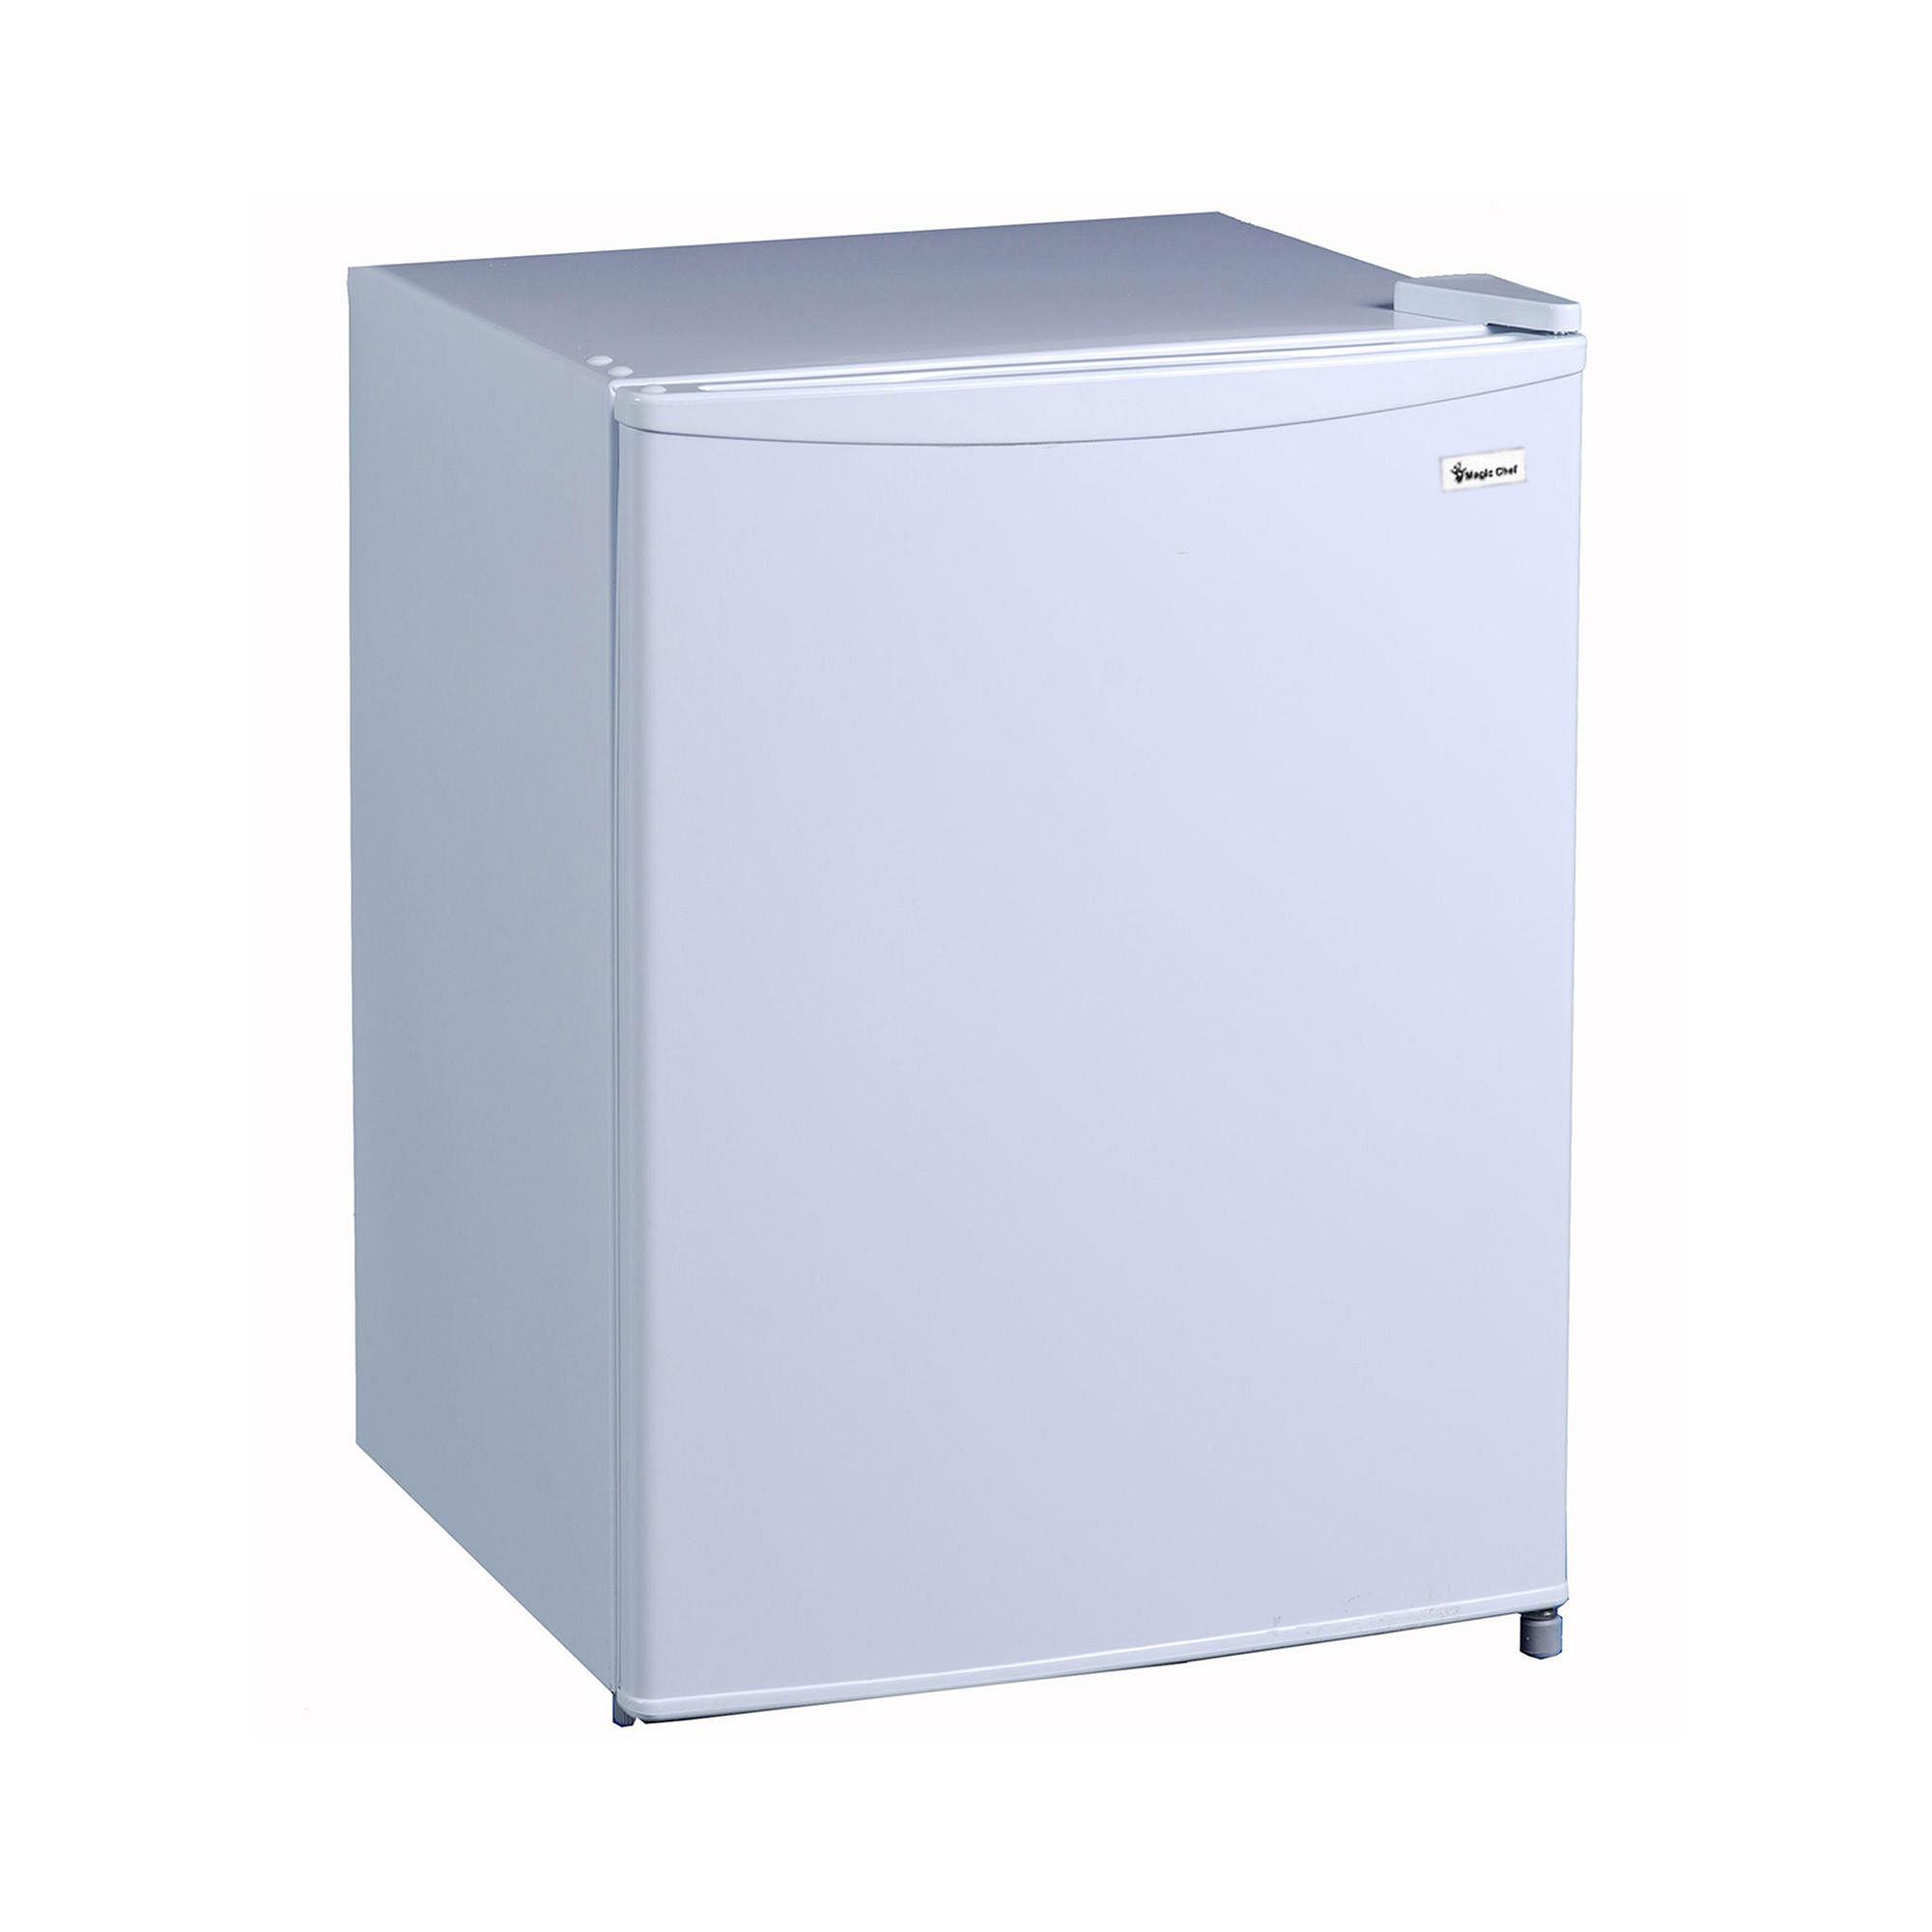 2.4 Compact Fridge with Freezer White